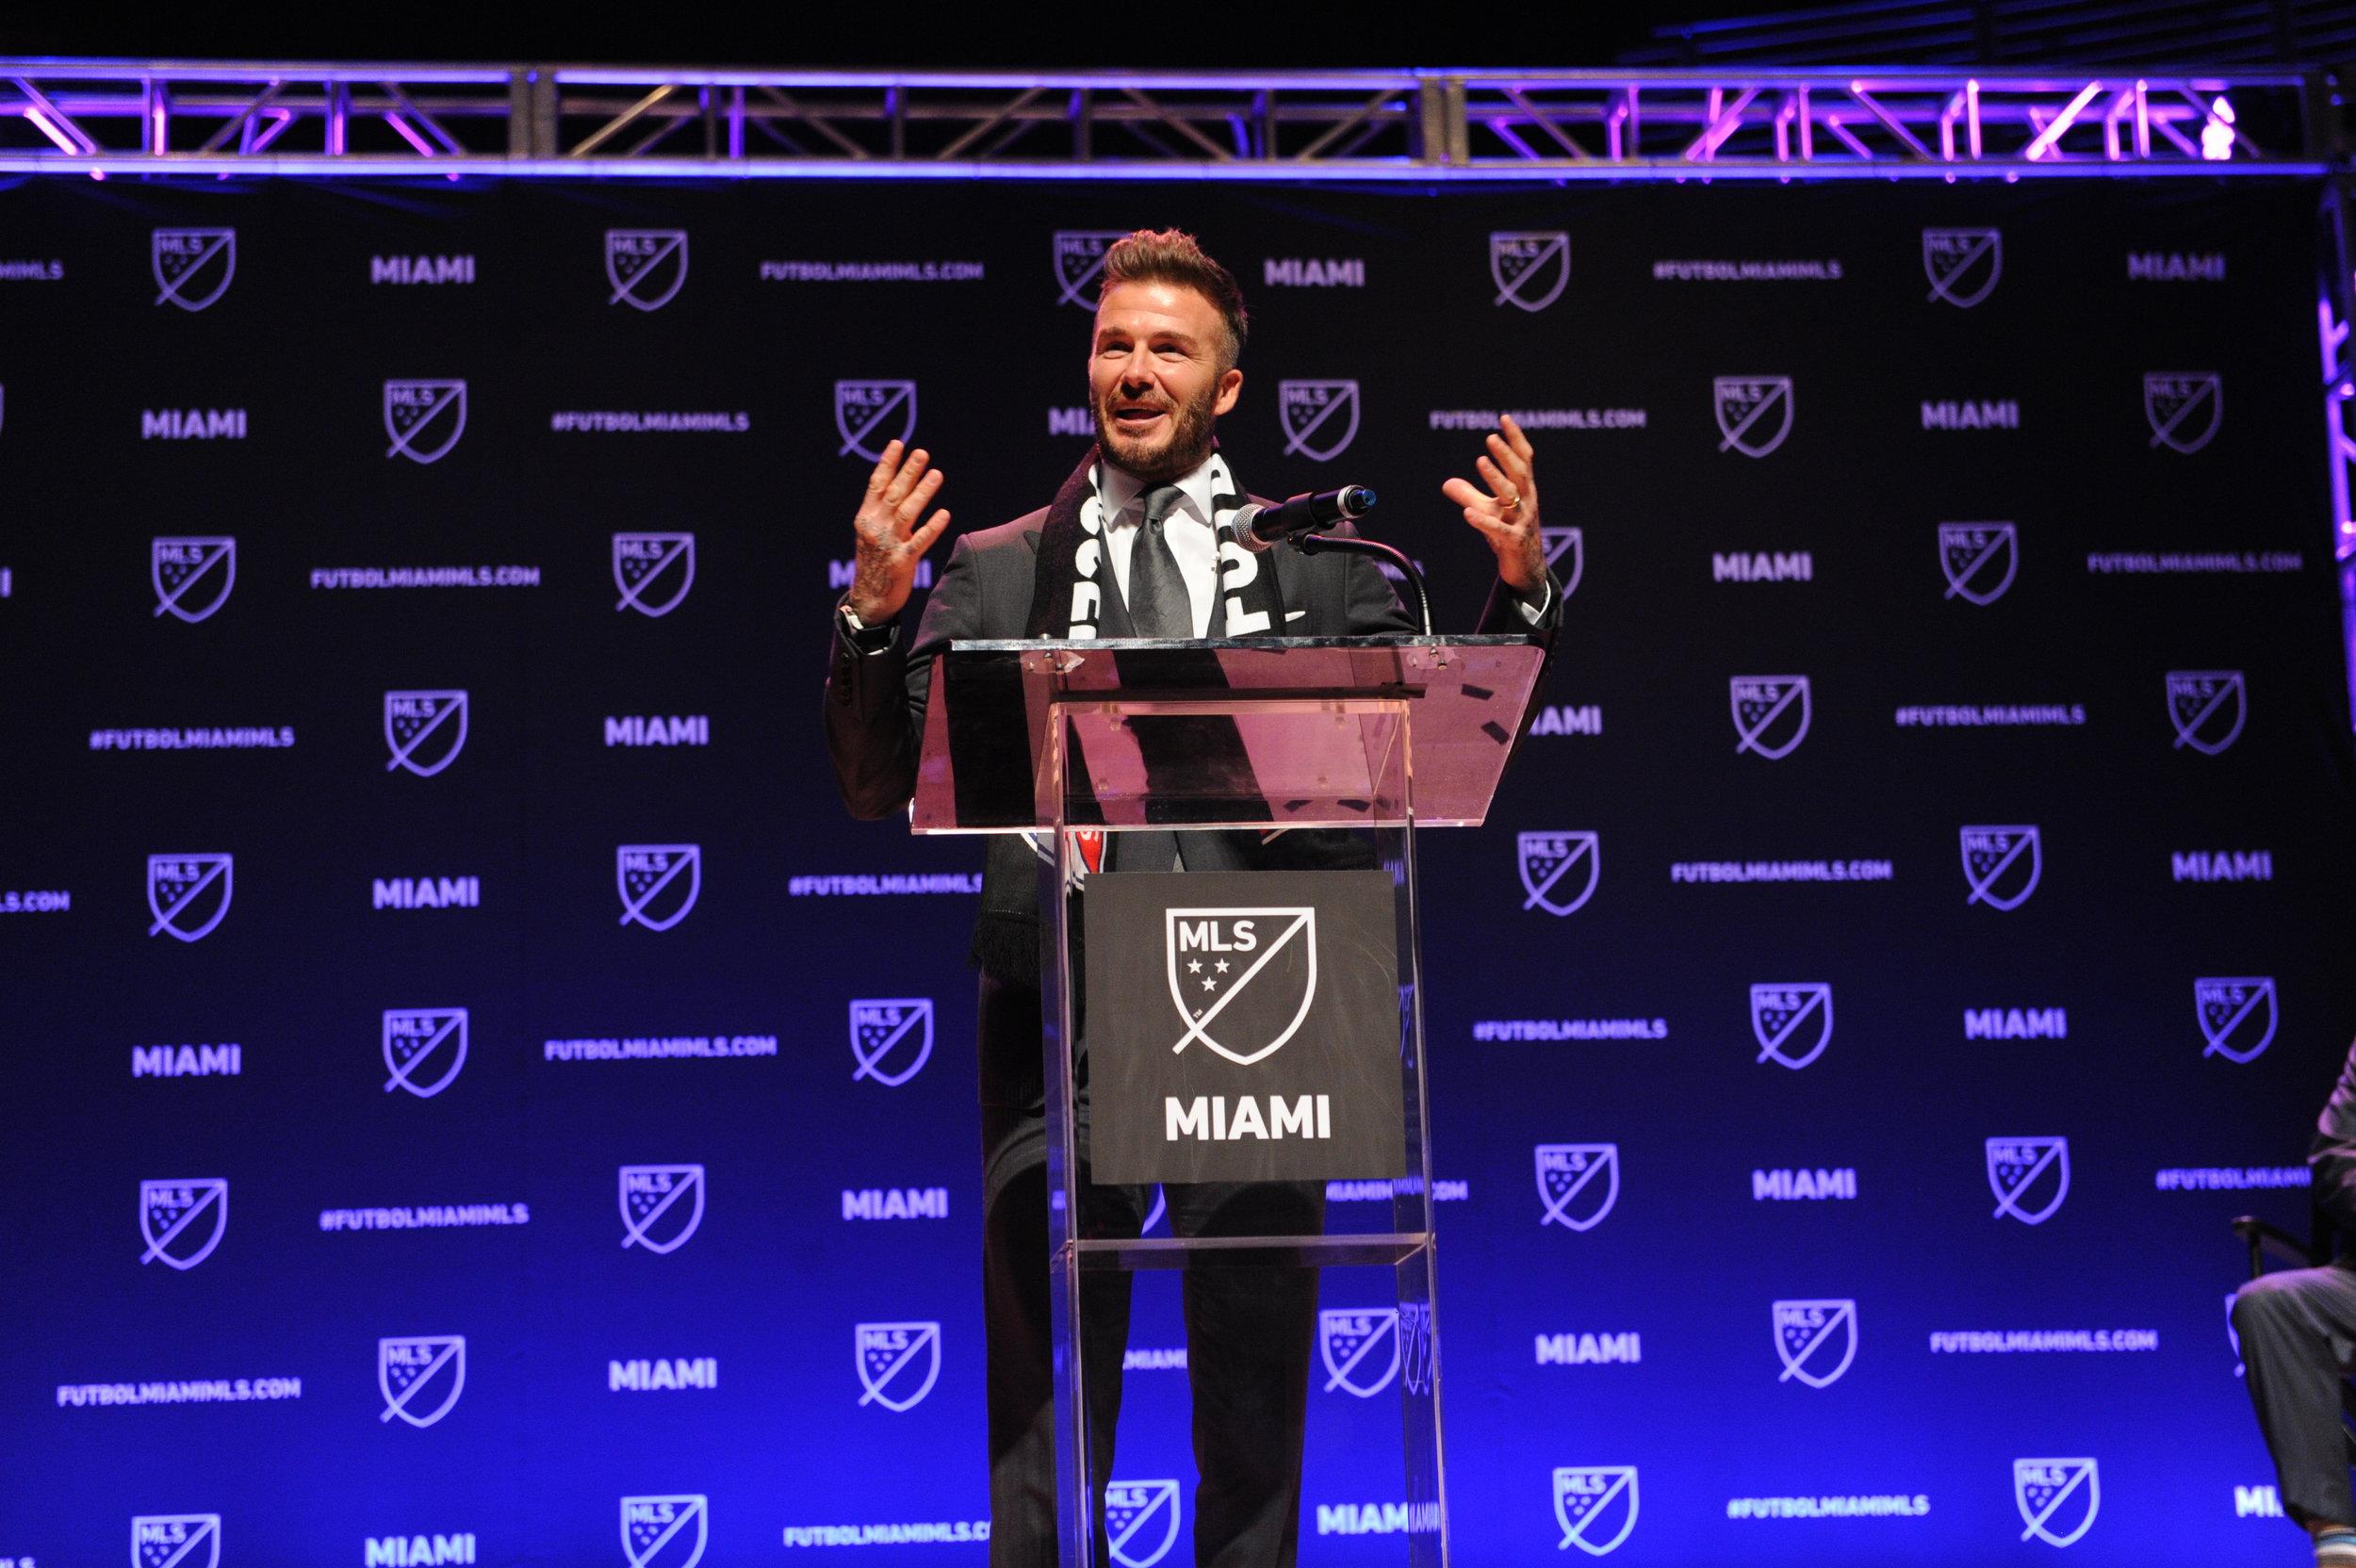 David Beckham's Plans for MLS Stadium Not Going Smoothly